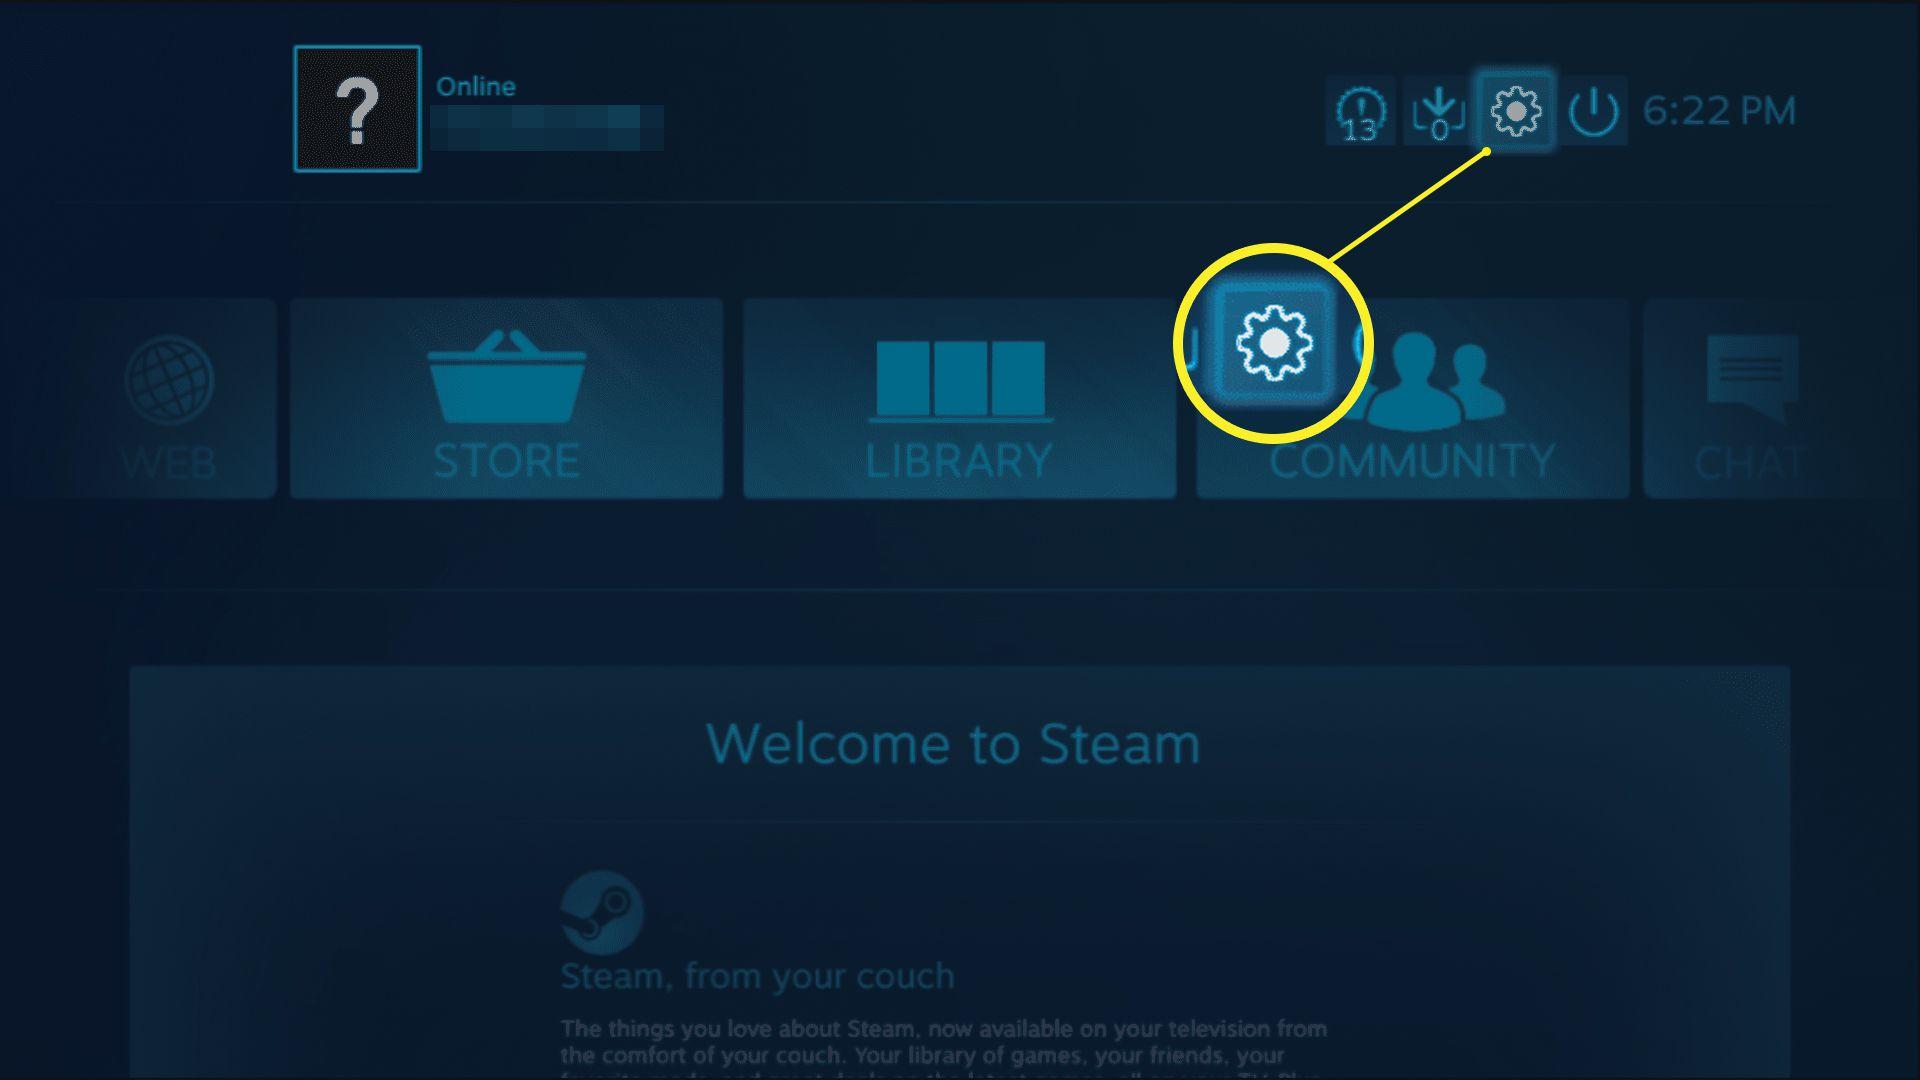 Steam settings icon